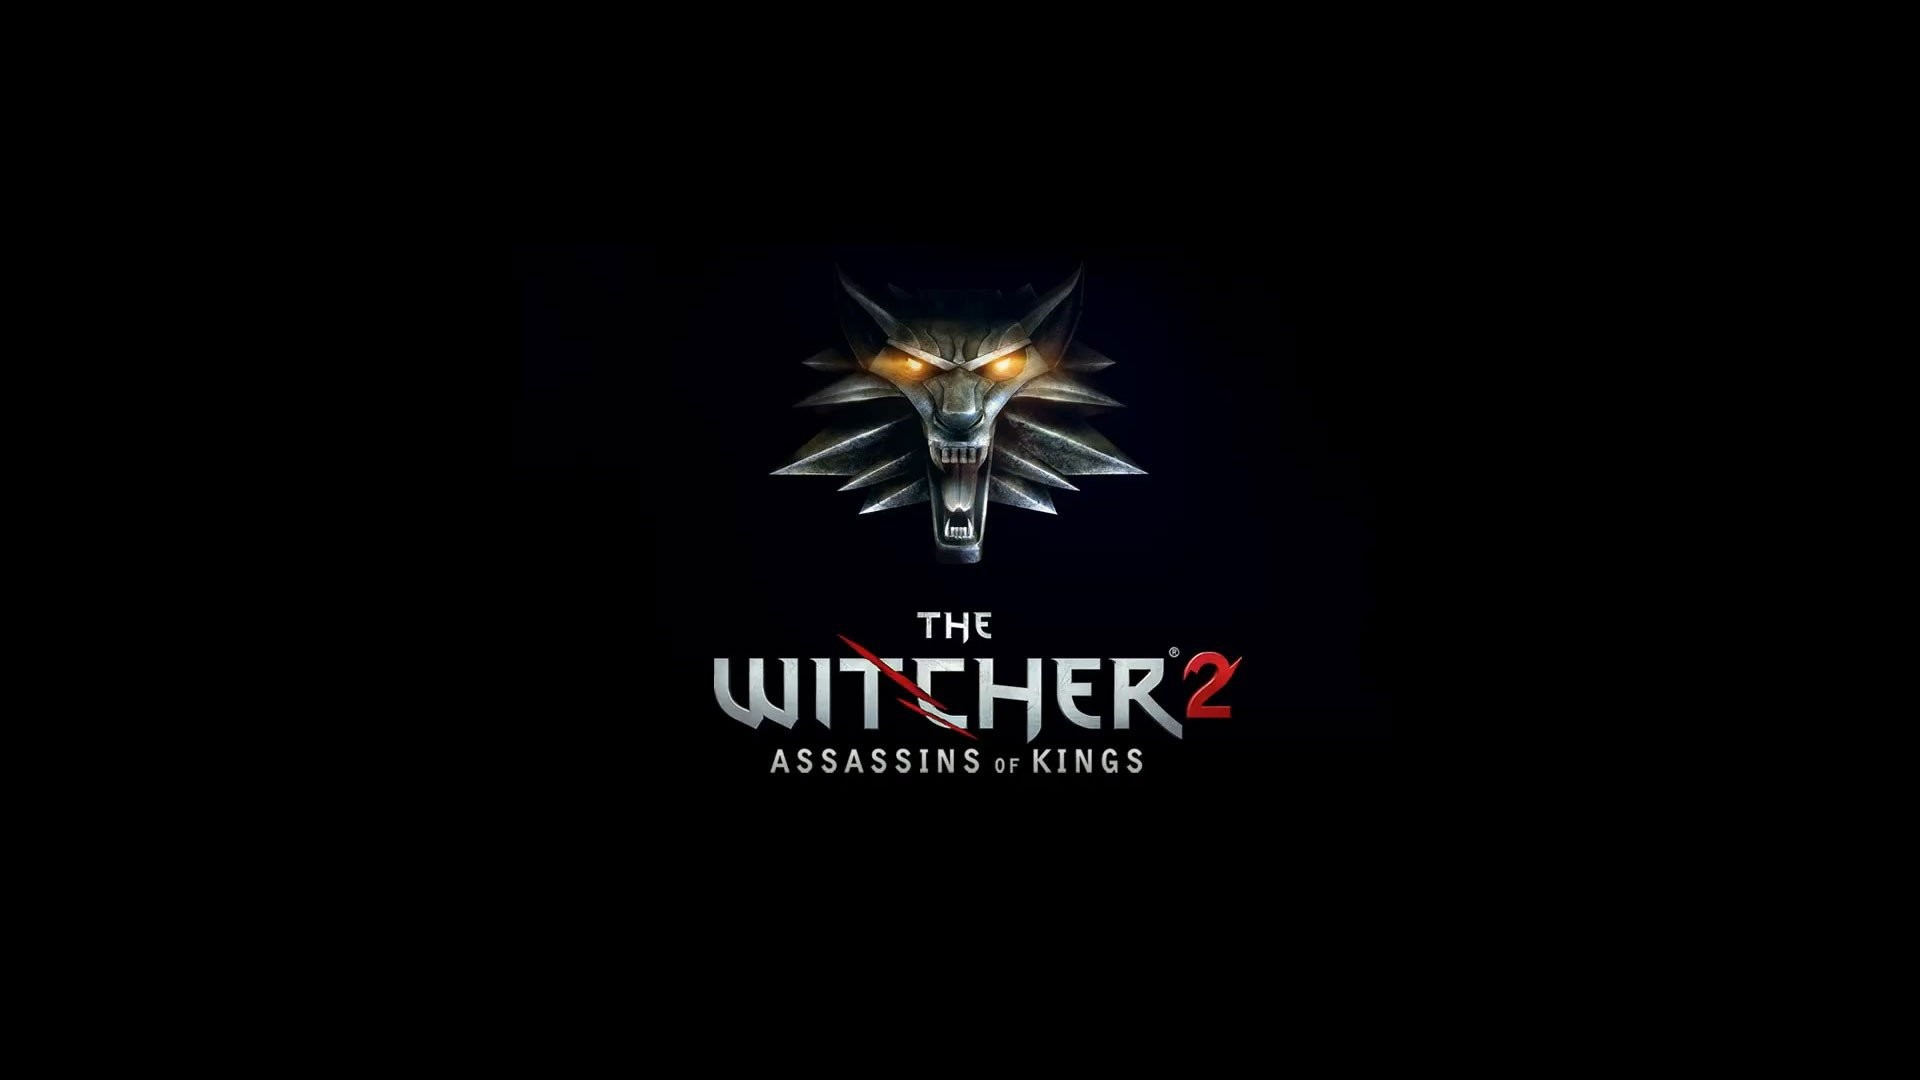 Video games logos The Witcher 2: Assassins of Kings wallpaper | |  294268 | WallpaperUP